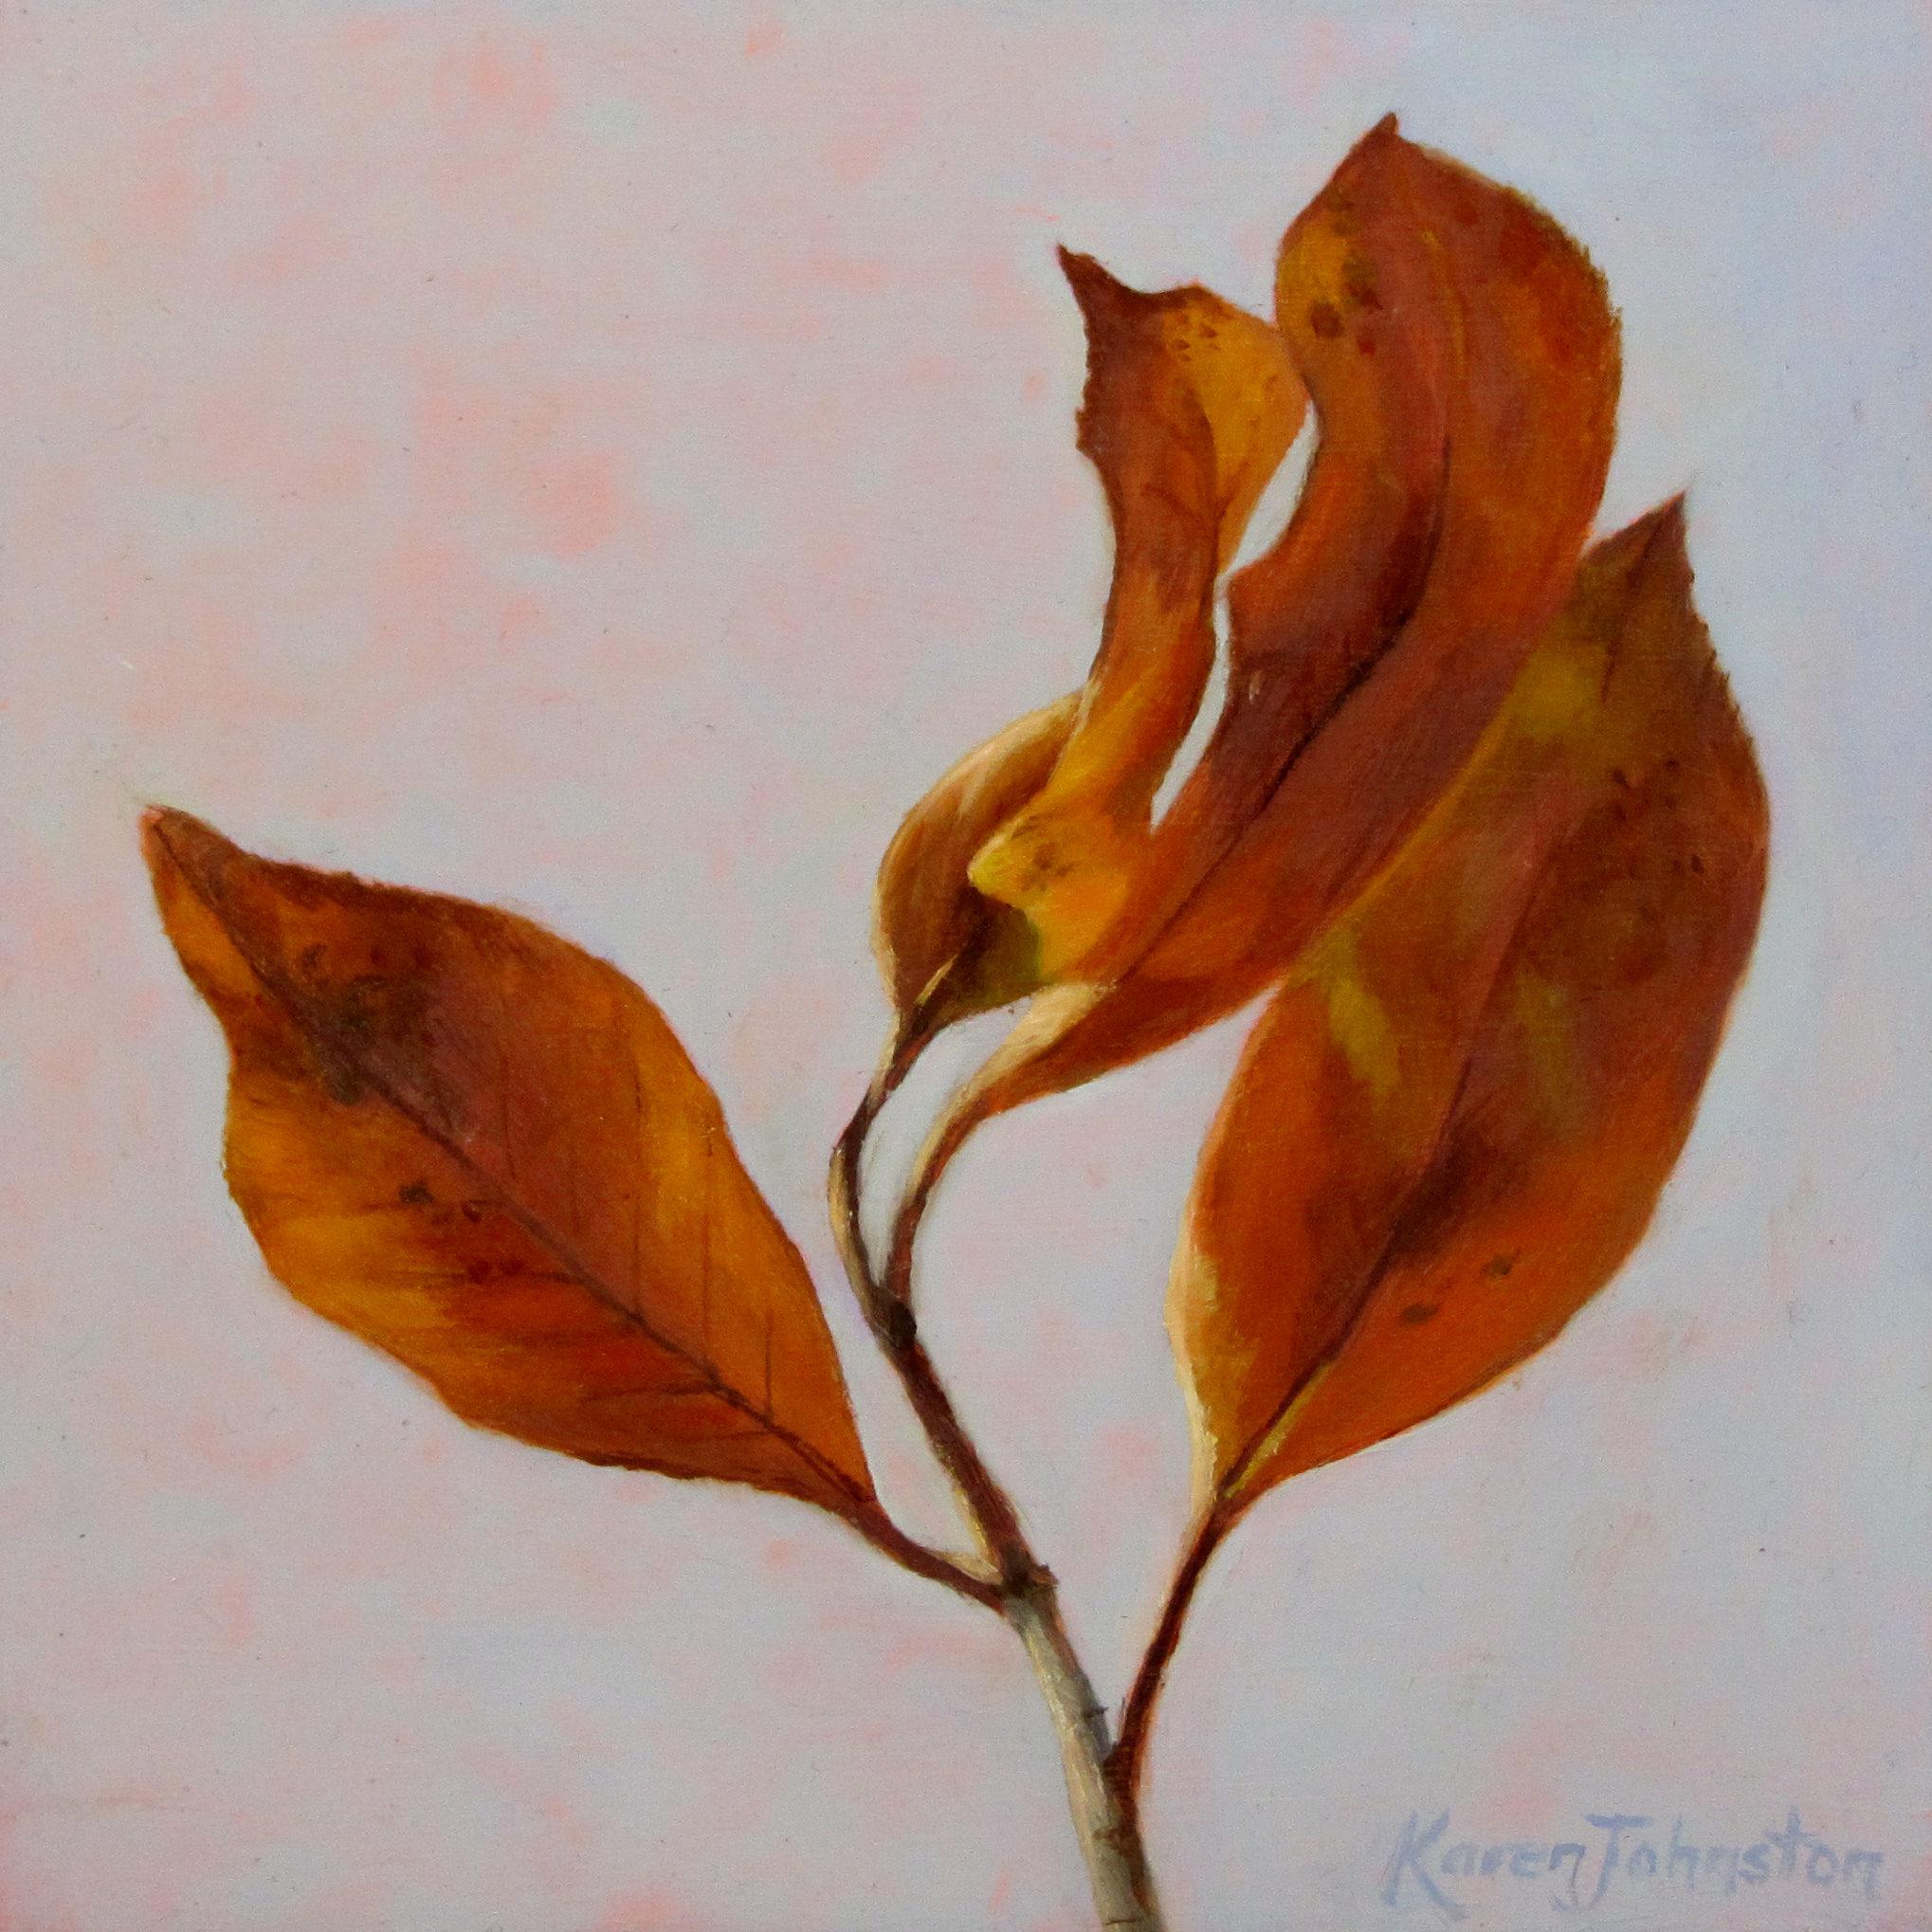 """Autumn Remnant"" original fine art by Karen Johnston"